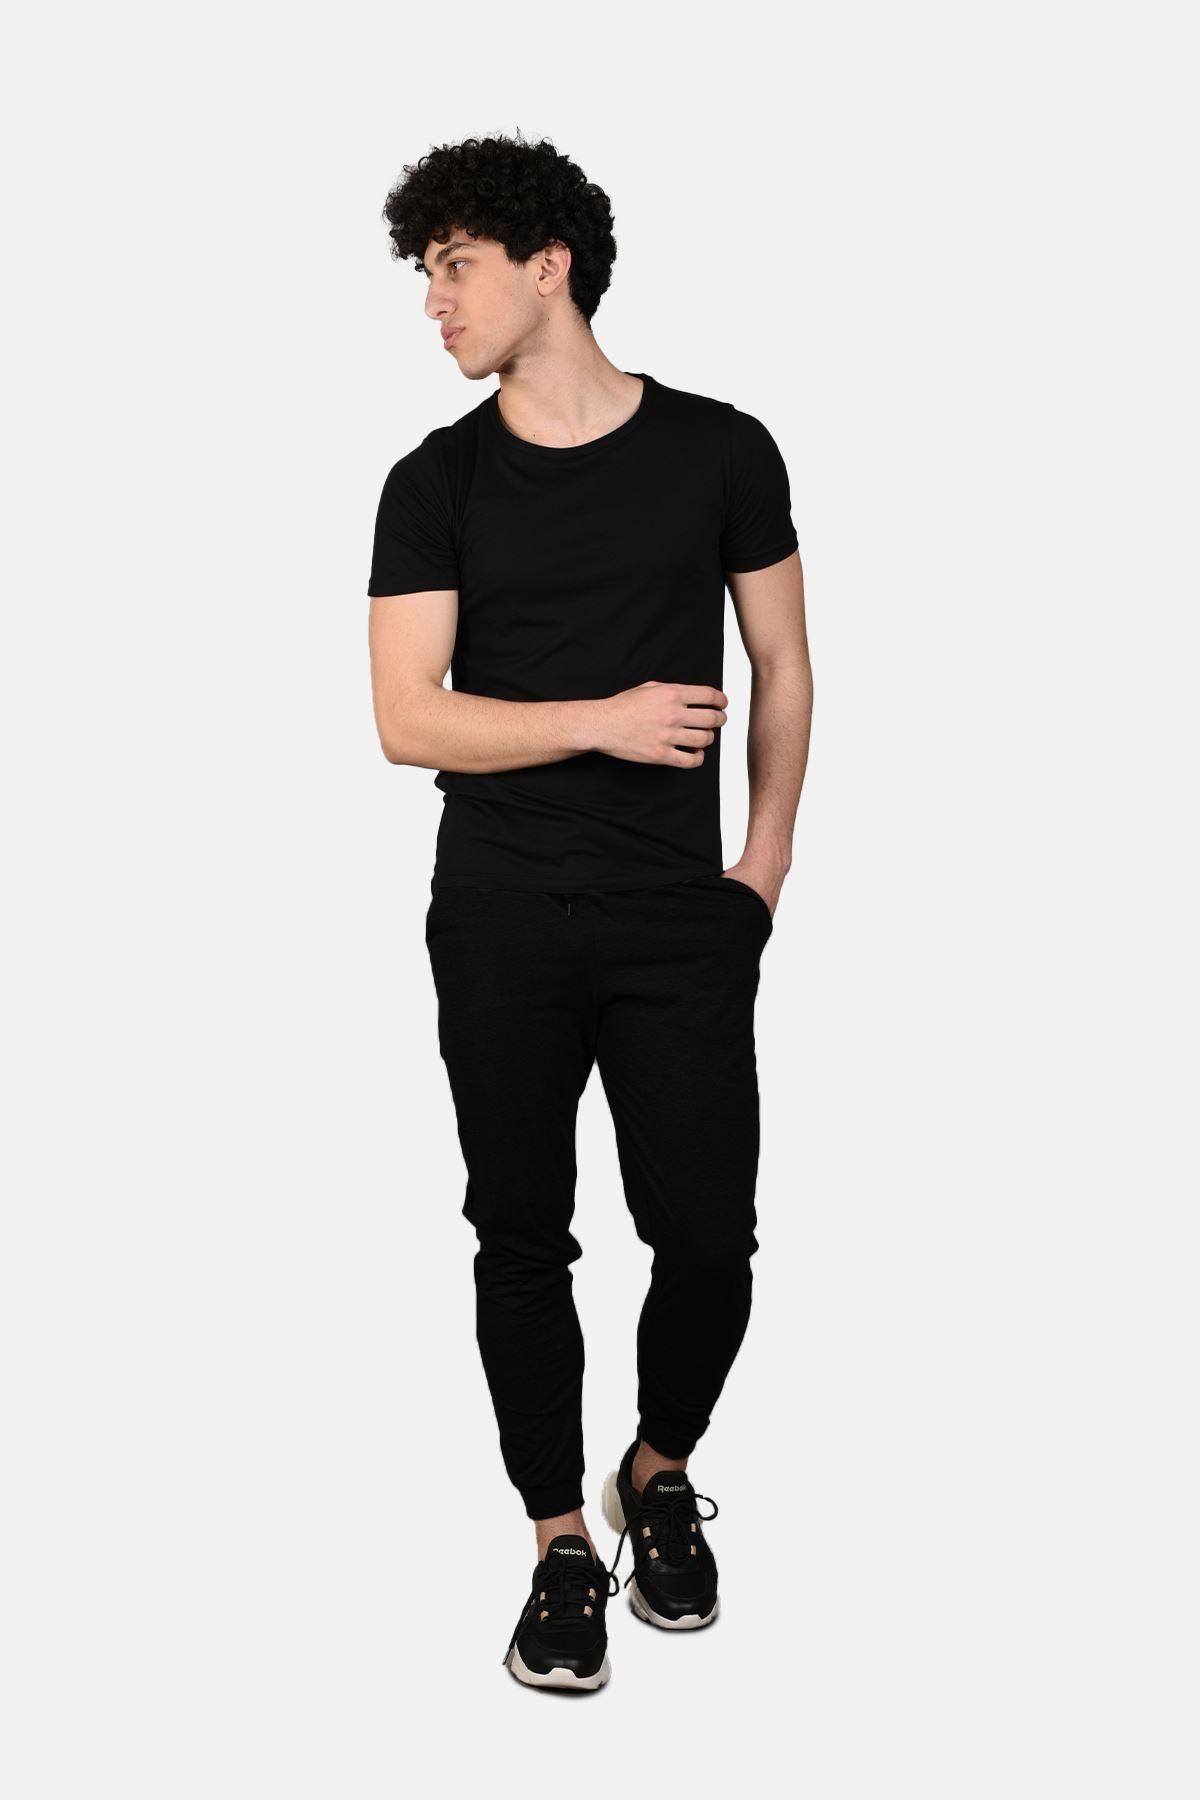 Malabadi Erkek Siyah Alt Siyah Üst Yuvarlak Yaka Yazlık Pijama Takımı M564